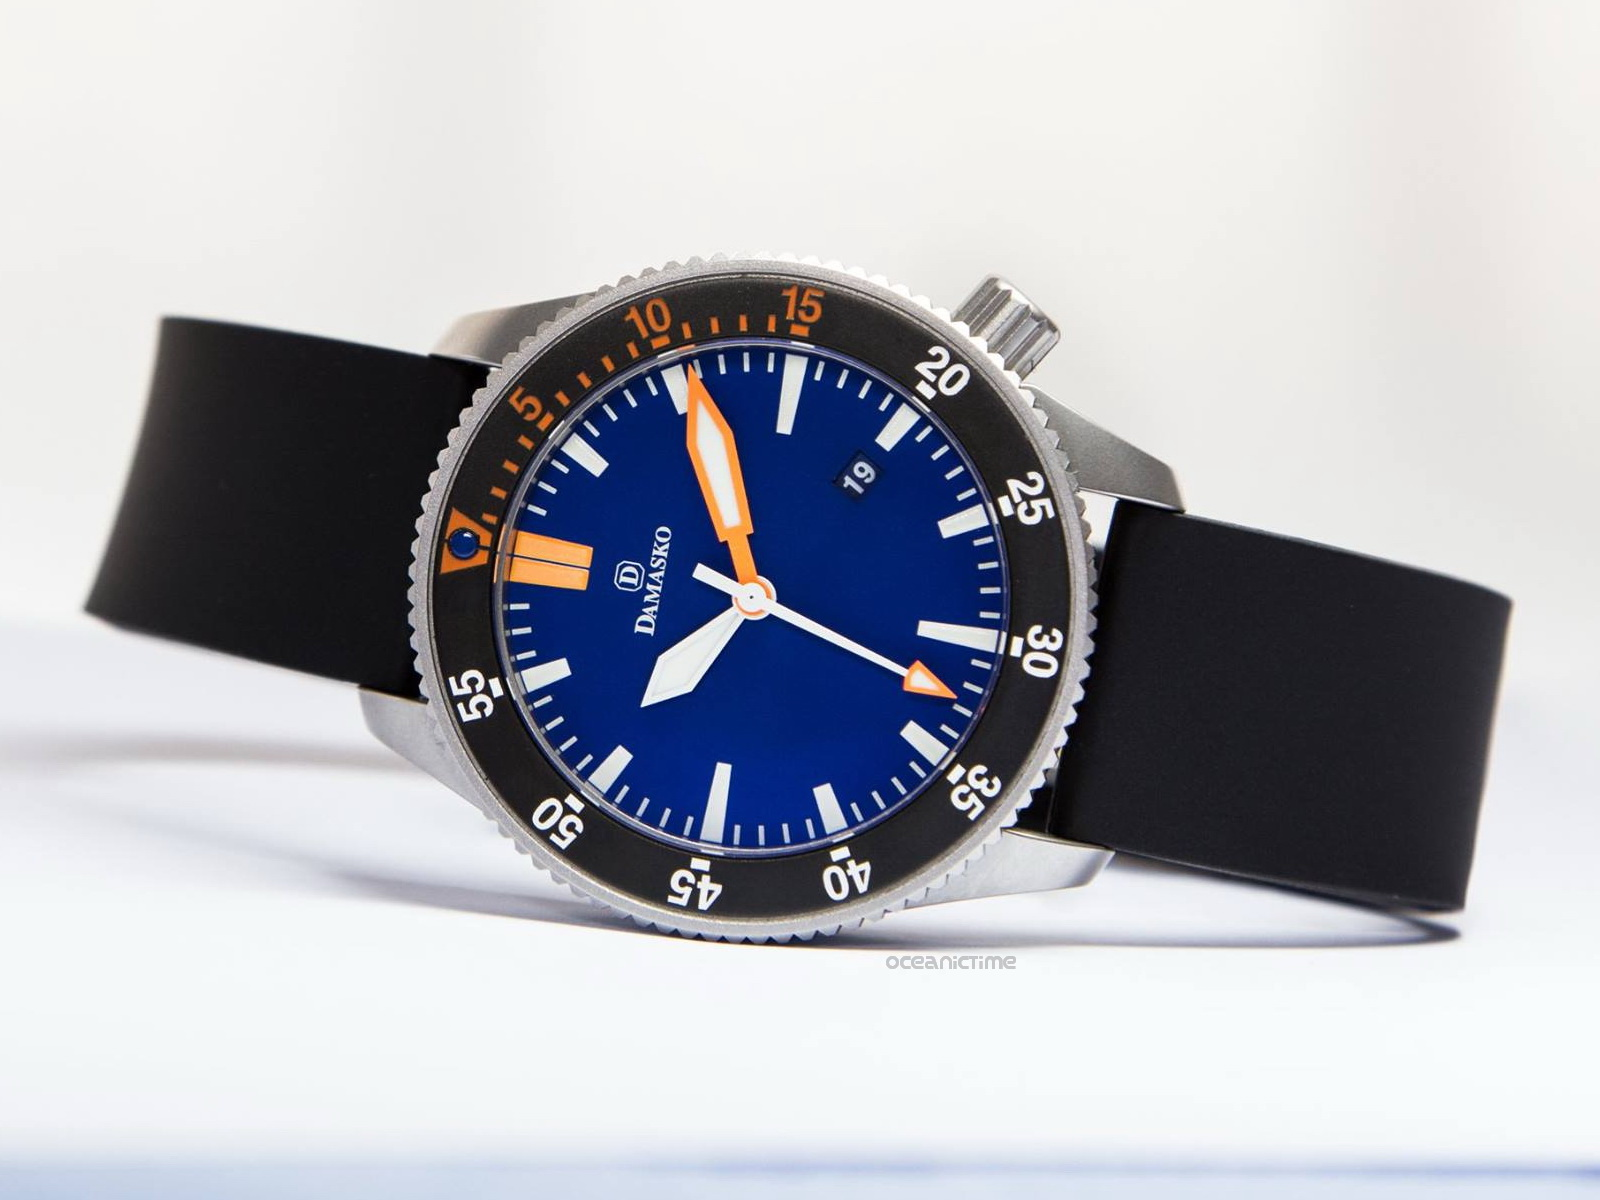 Oceanictime damasko dsub1 2ndlook new blue for Damasko watches